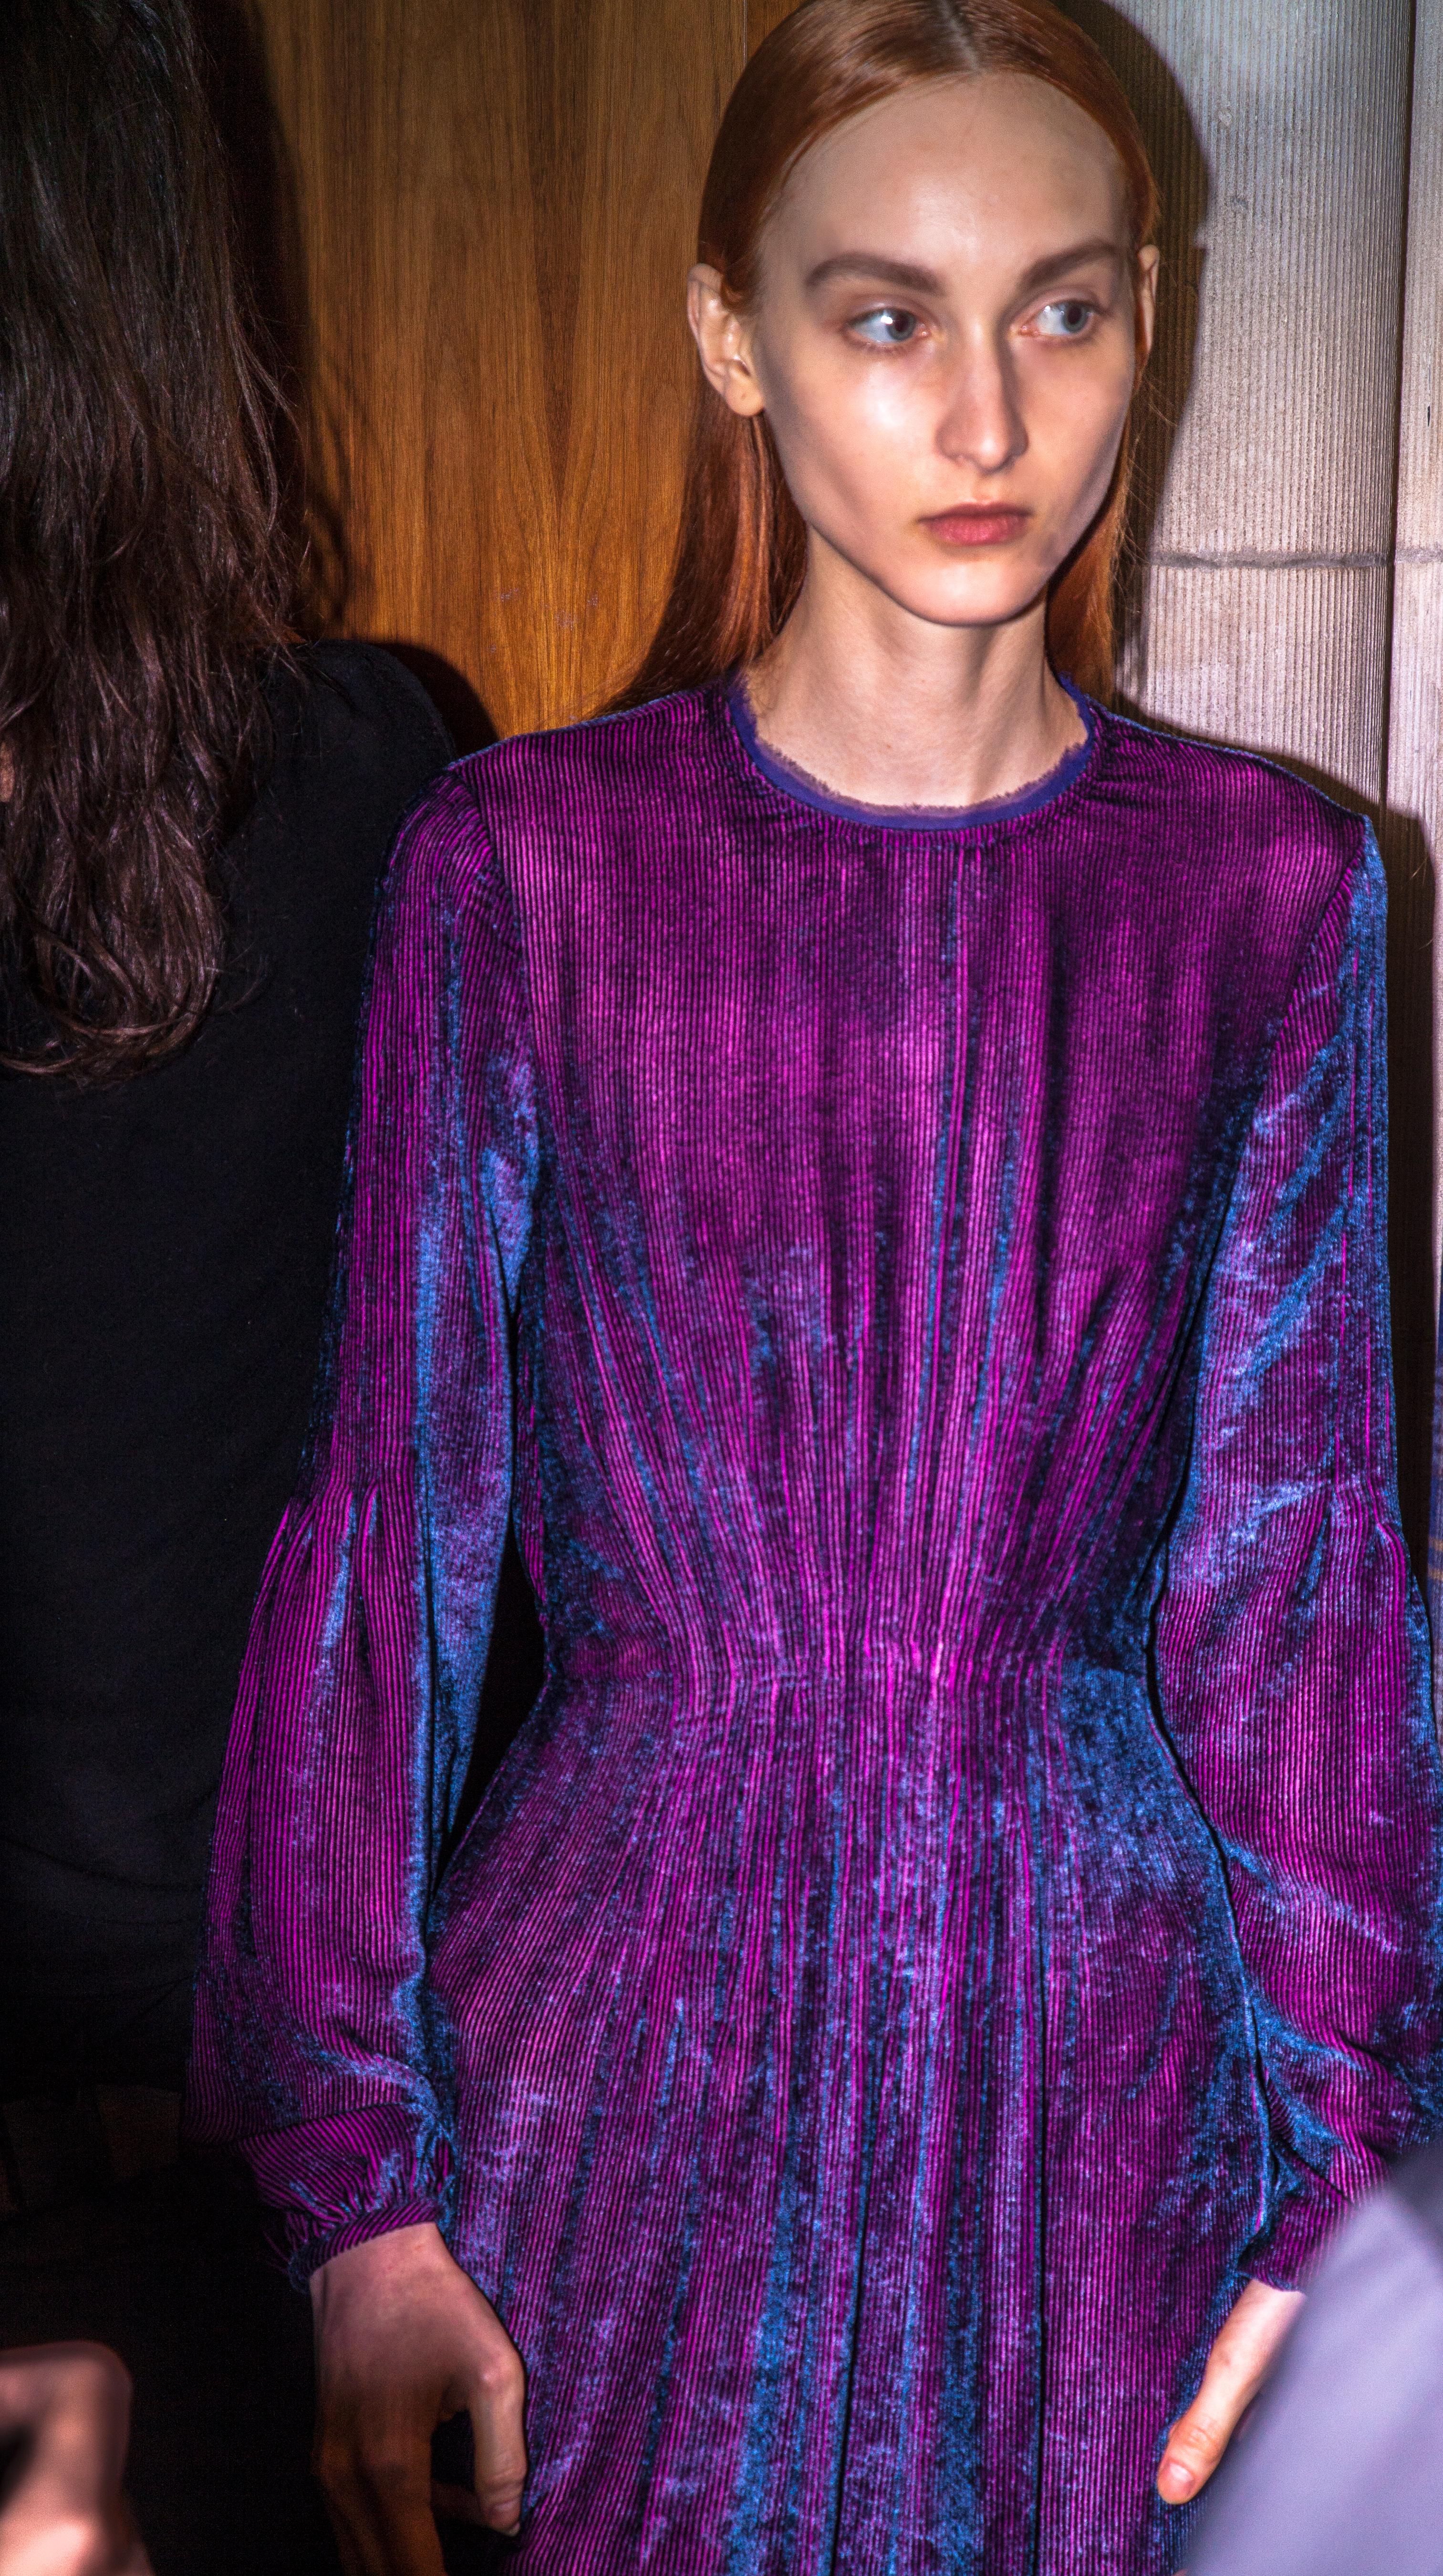 Models Gabriela Hearst Fashion clothing PHOTOS-3